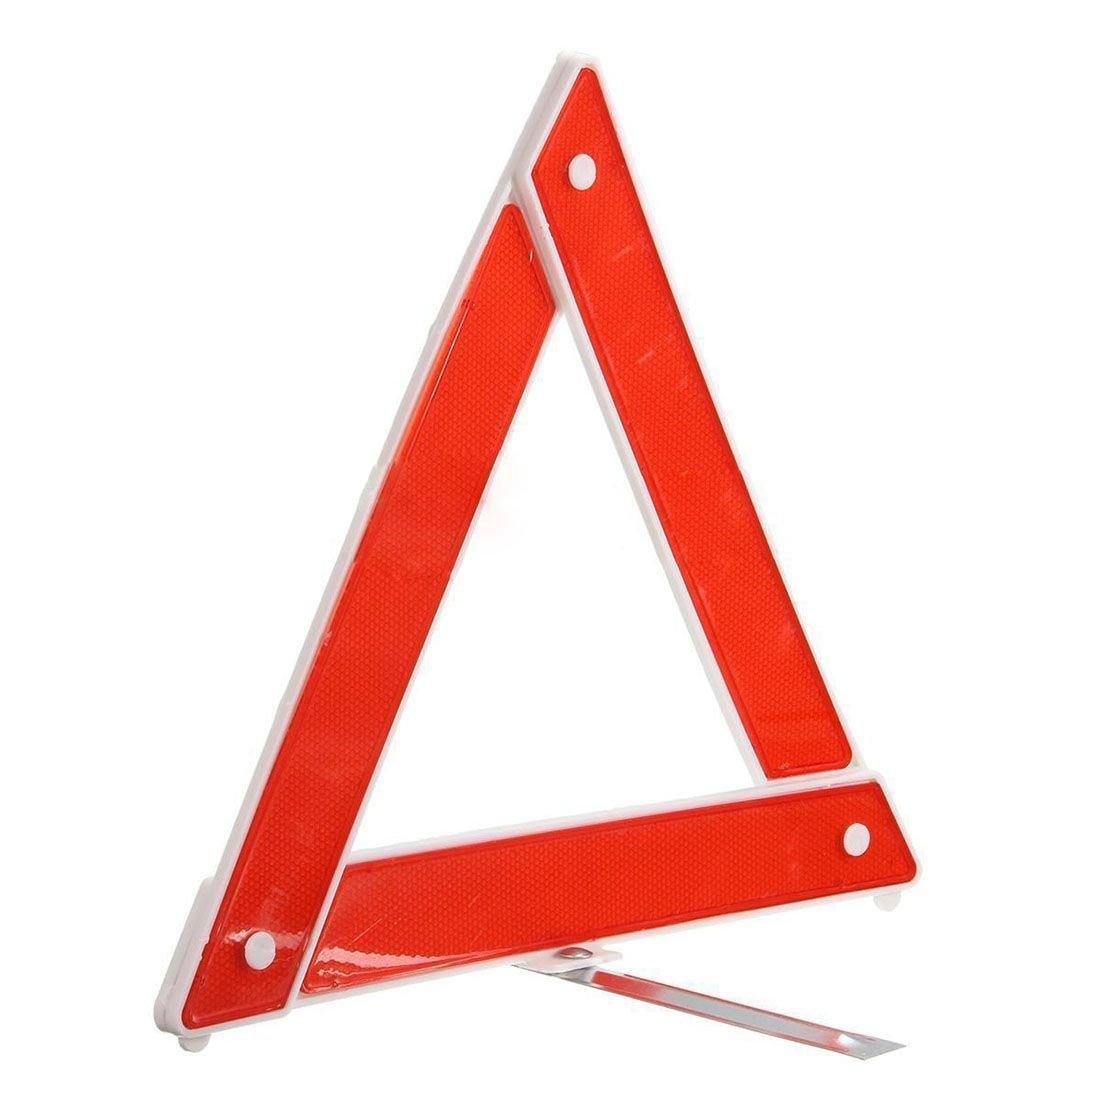 TOOGOO(R) Reflektieren Warndreieck Warnsignal Dreieck Auto Notfall Pannenwarndreieck Dreieck 099513